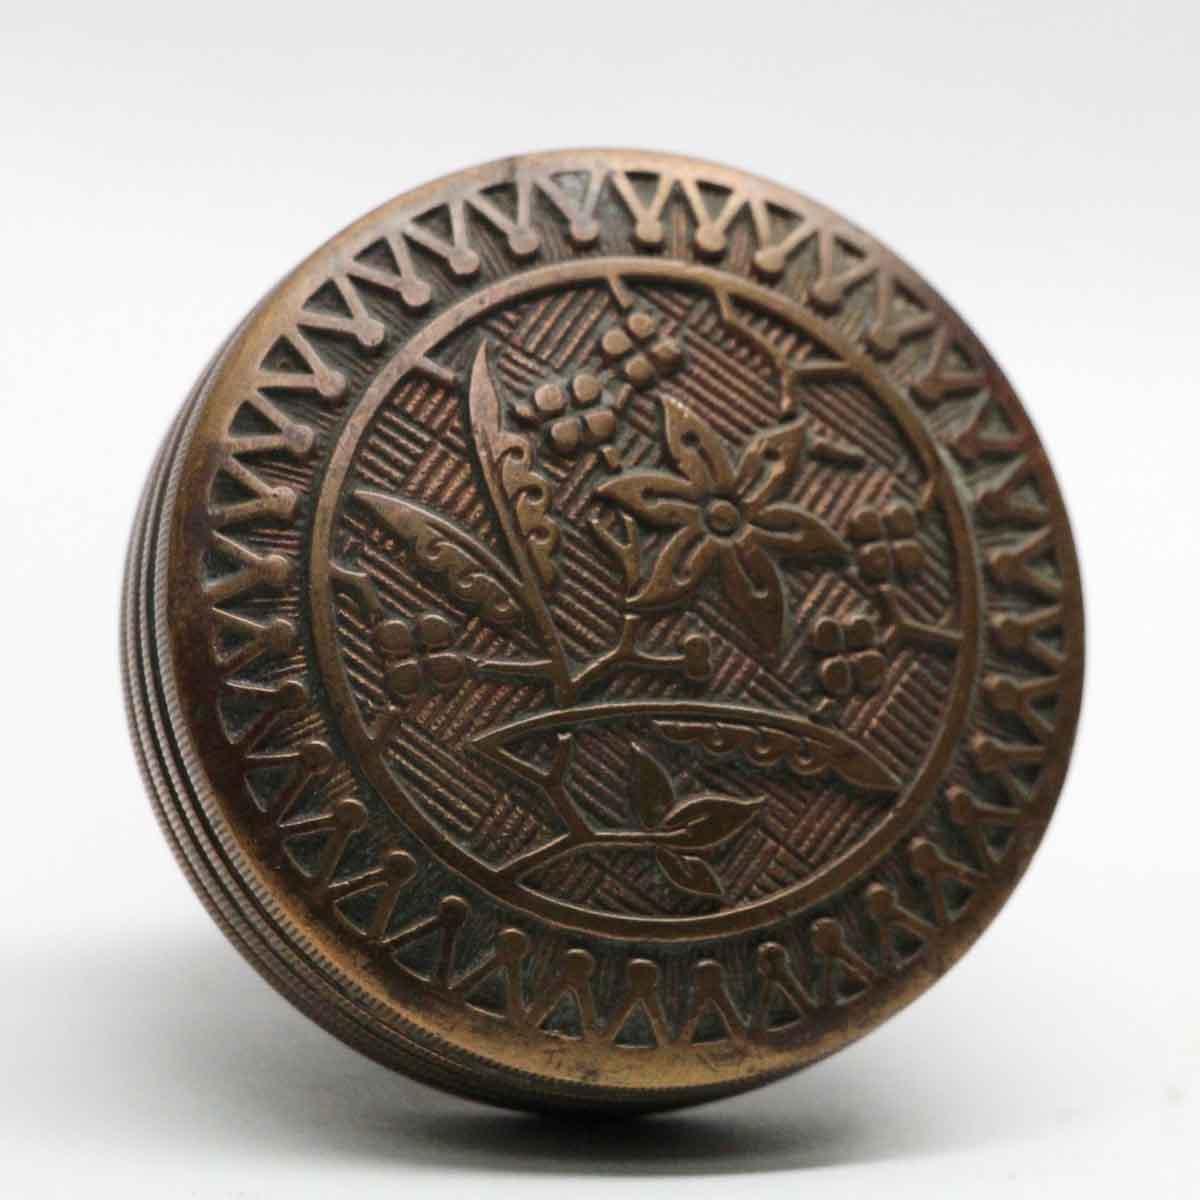 Antique Bronze Asymmetrical Sargent Door Knobs | Olde Good Things